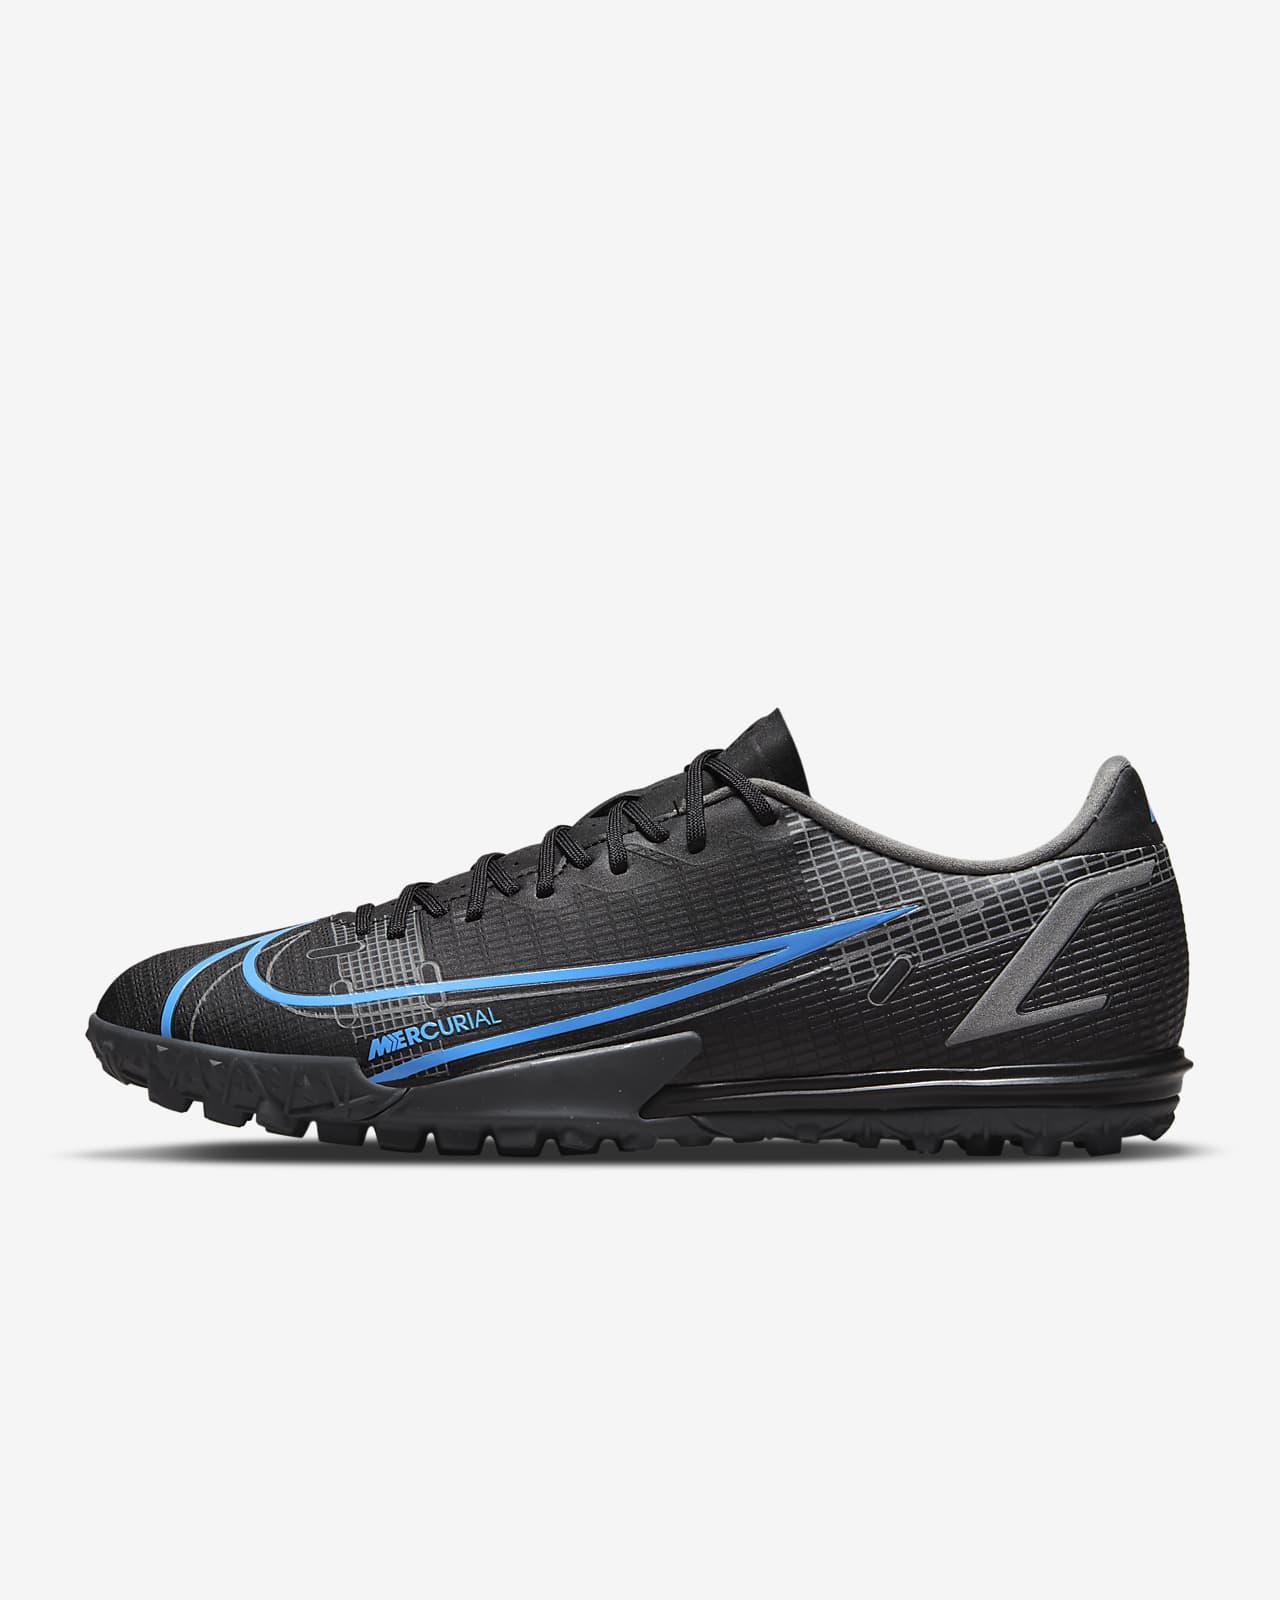 Nike Mercurial Vapor 14 Academy TF Turf Soccer Shoe